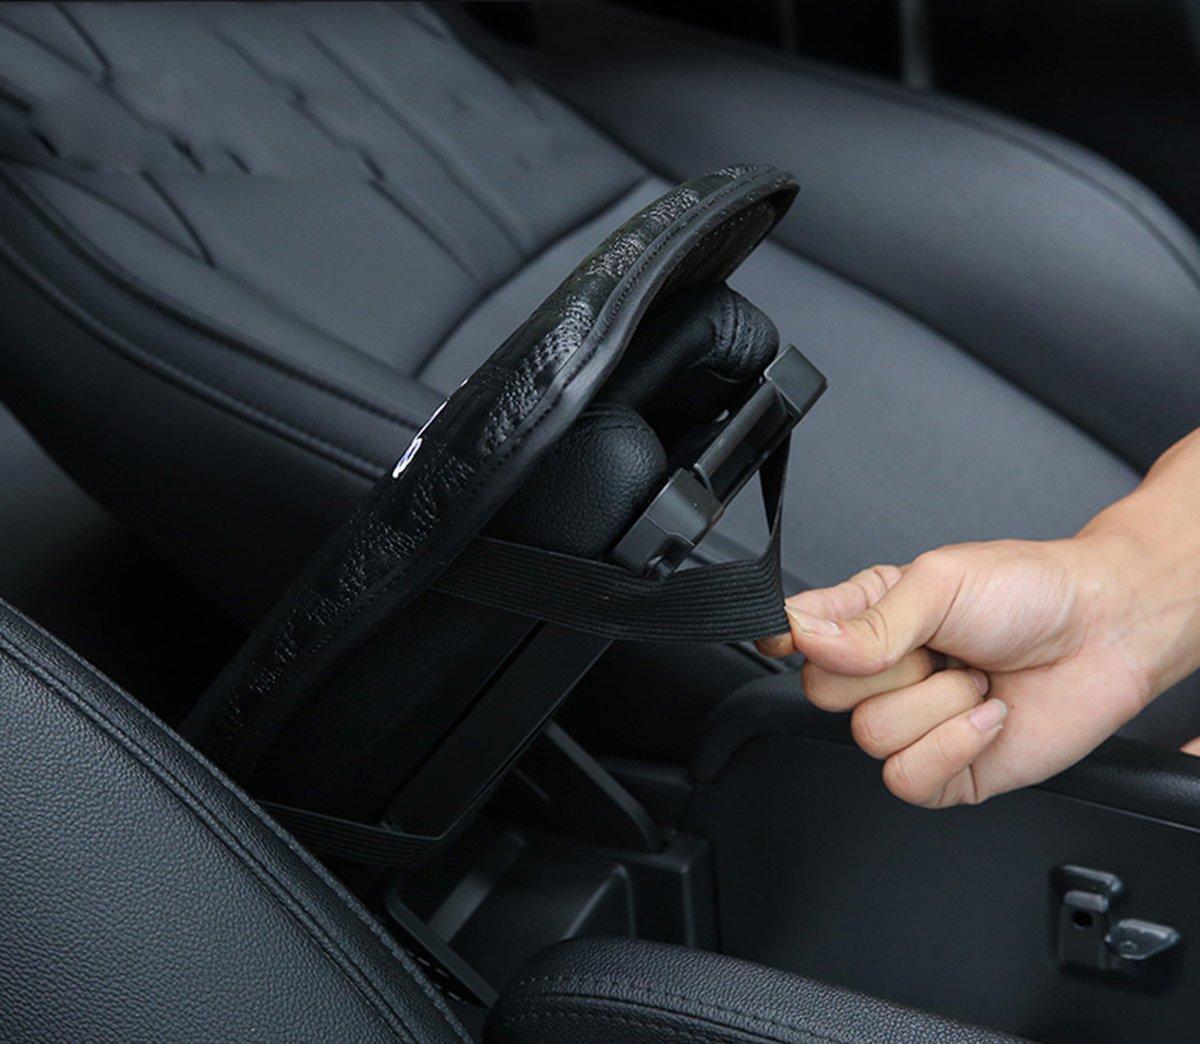 1999 2001 2000 2002 Audi A8 Sedan Black Loop Driver /& Passenger GGBAILEY D2699A-F1A-BK-LP Custom Fit Automotive Carpet Floor Mats for 1997 1998